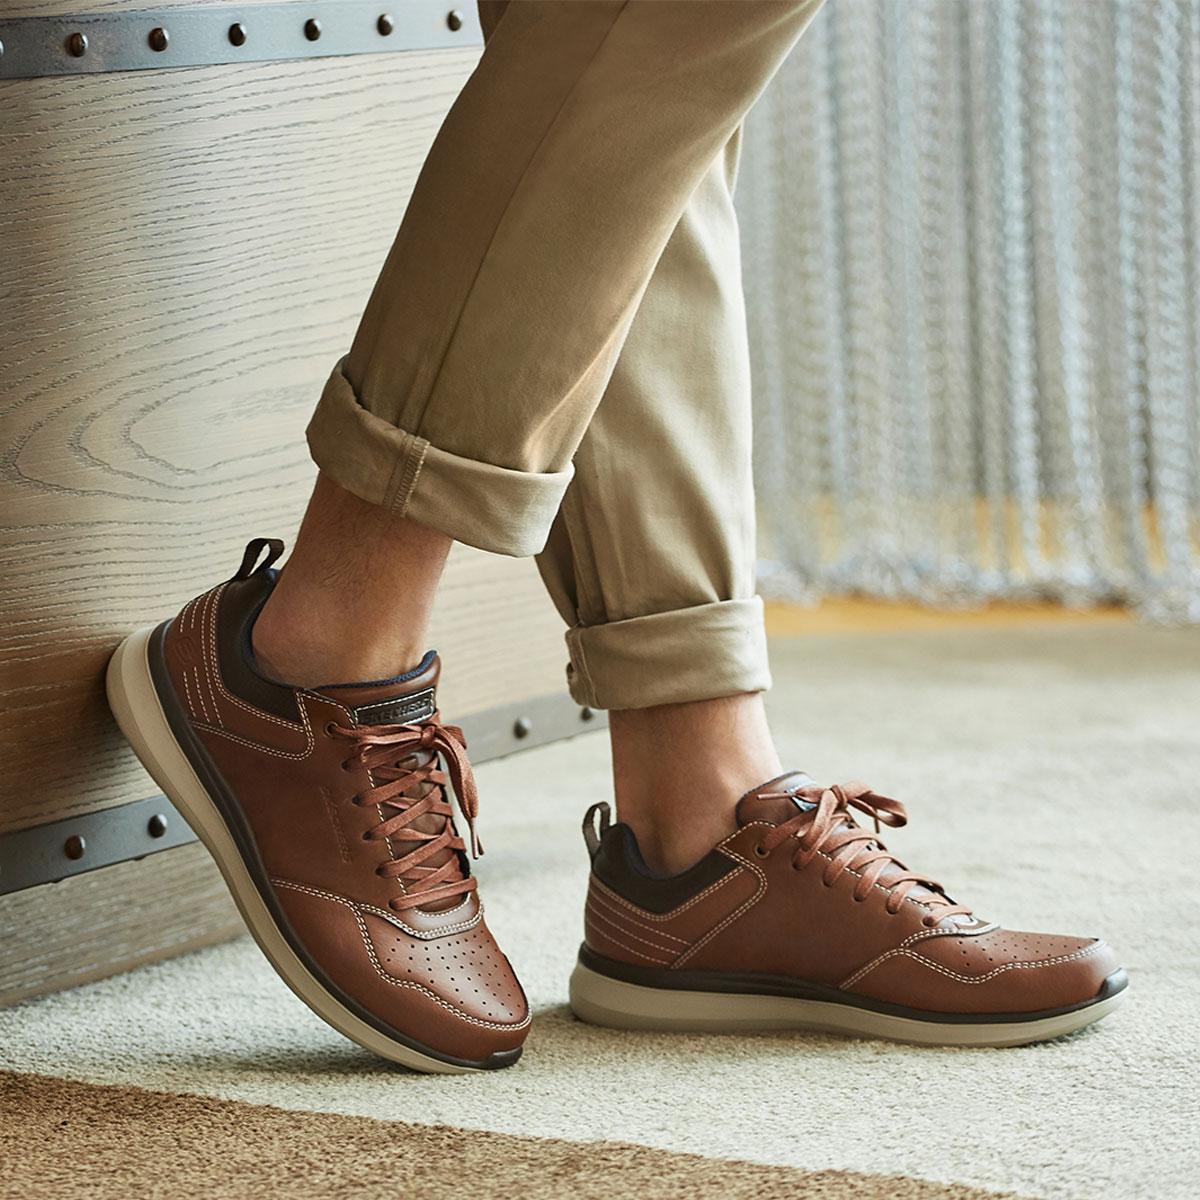 SKECHERS 斯凯奇 66439-BRN 男士绑带时尚休闲鞋